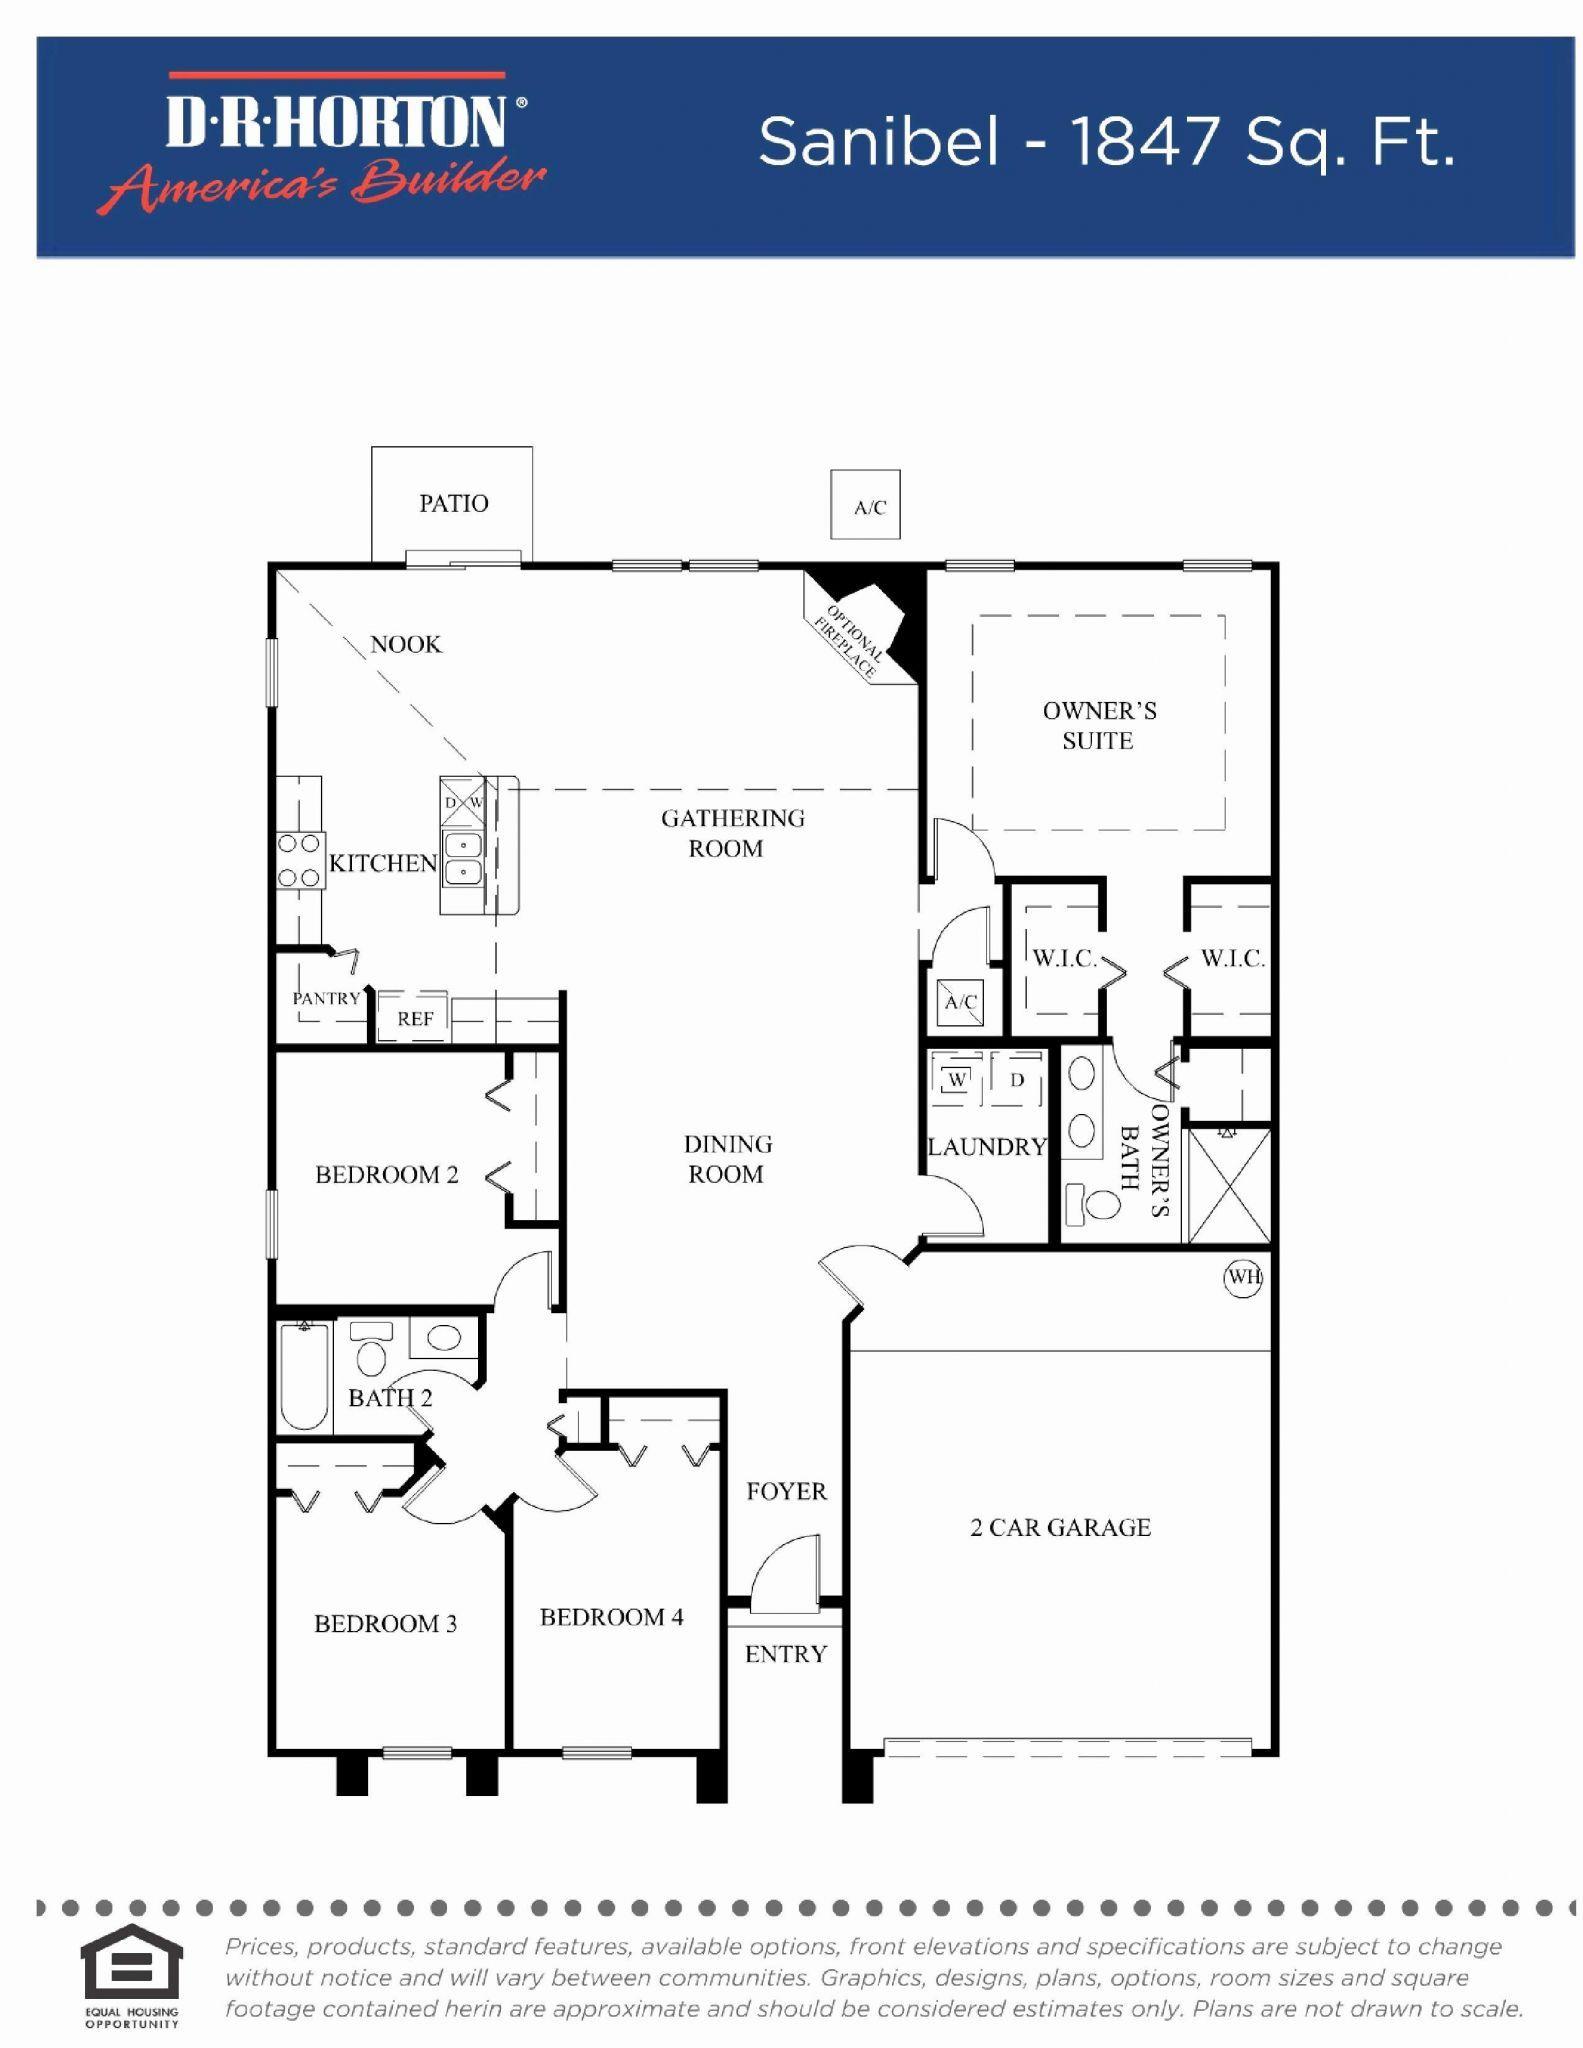 Dr Horton Houston Floor Plans Check more at horton houston fl